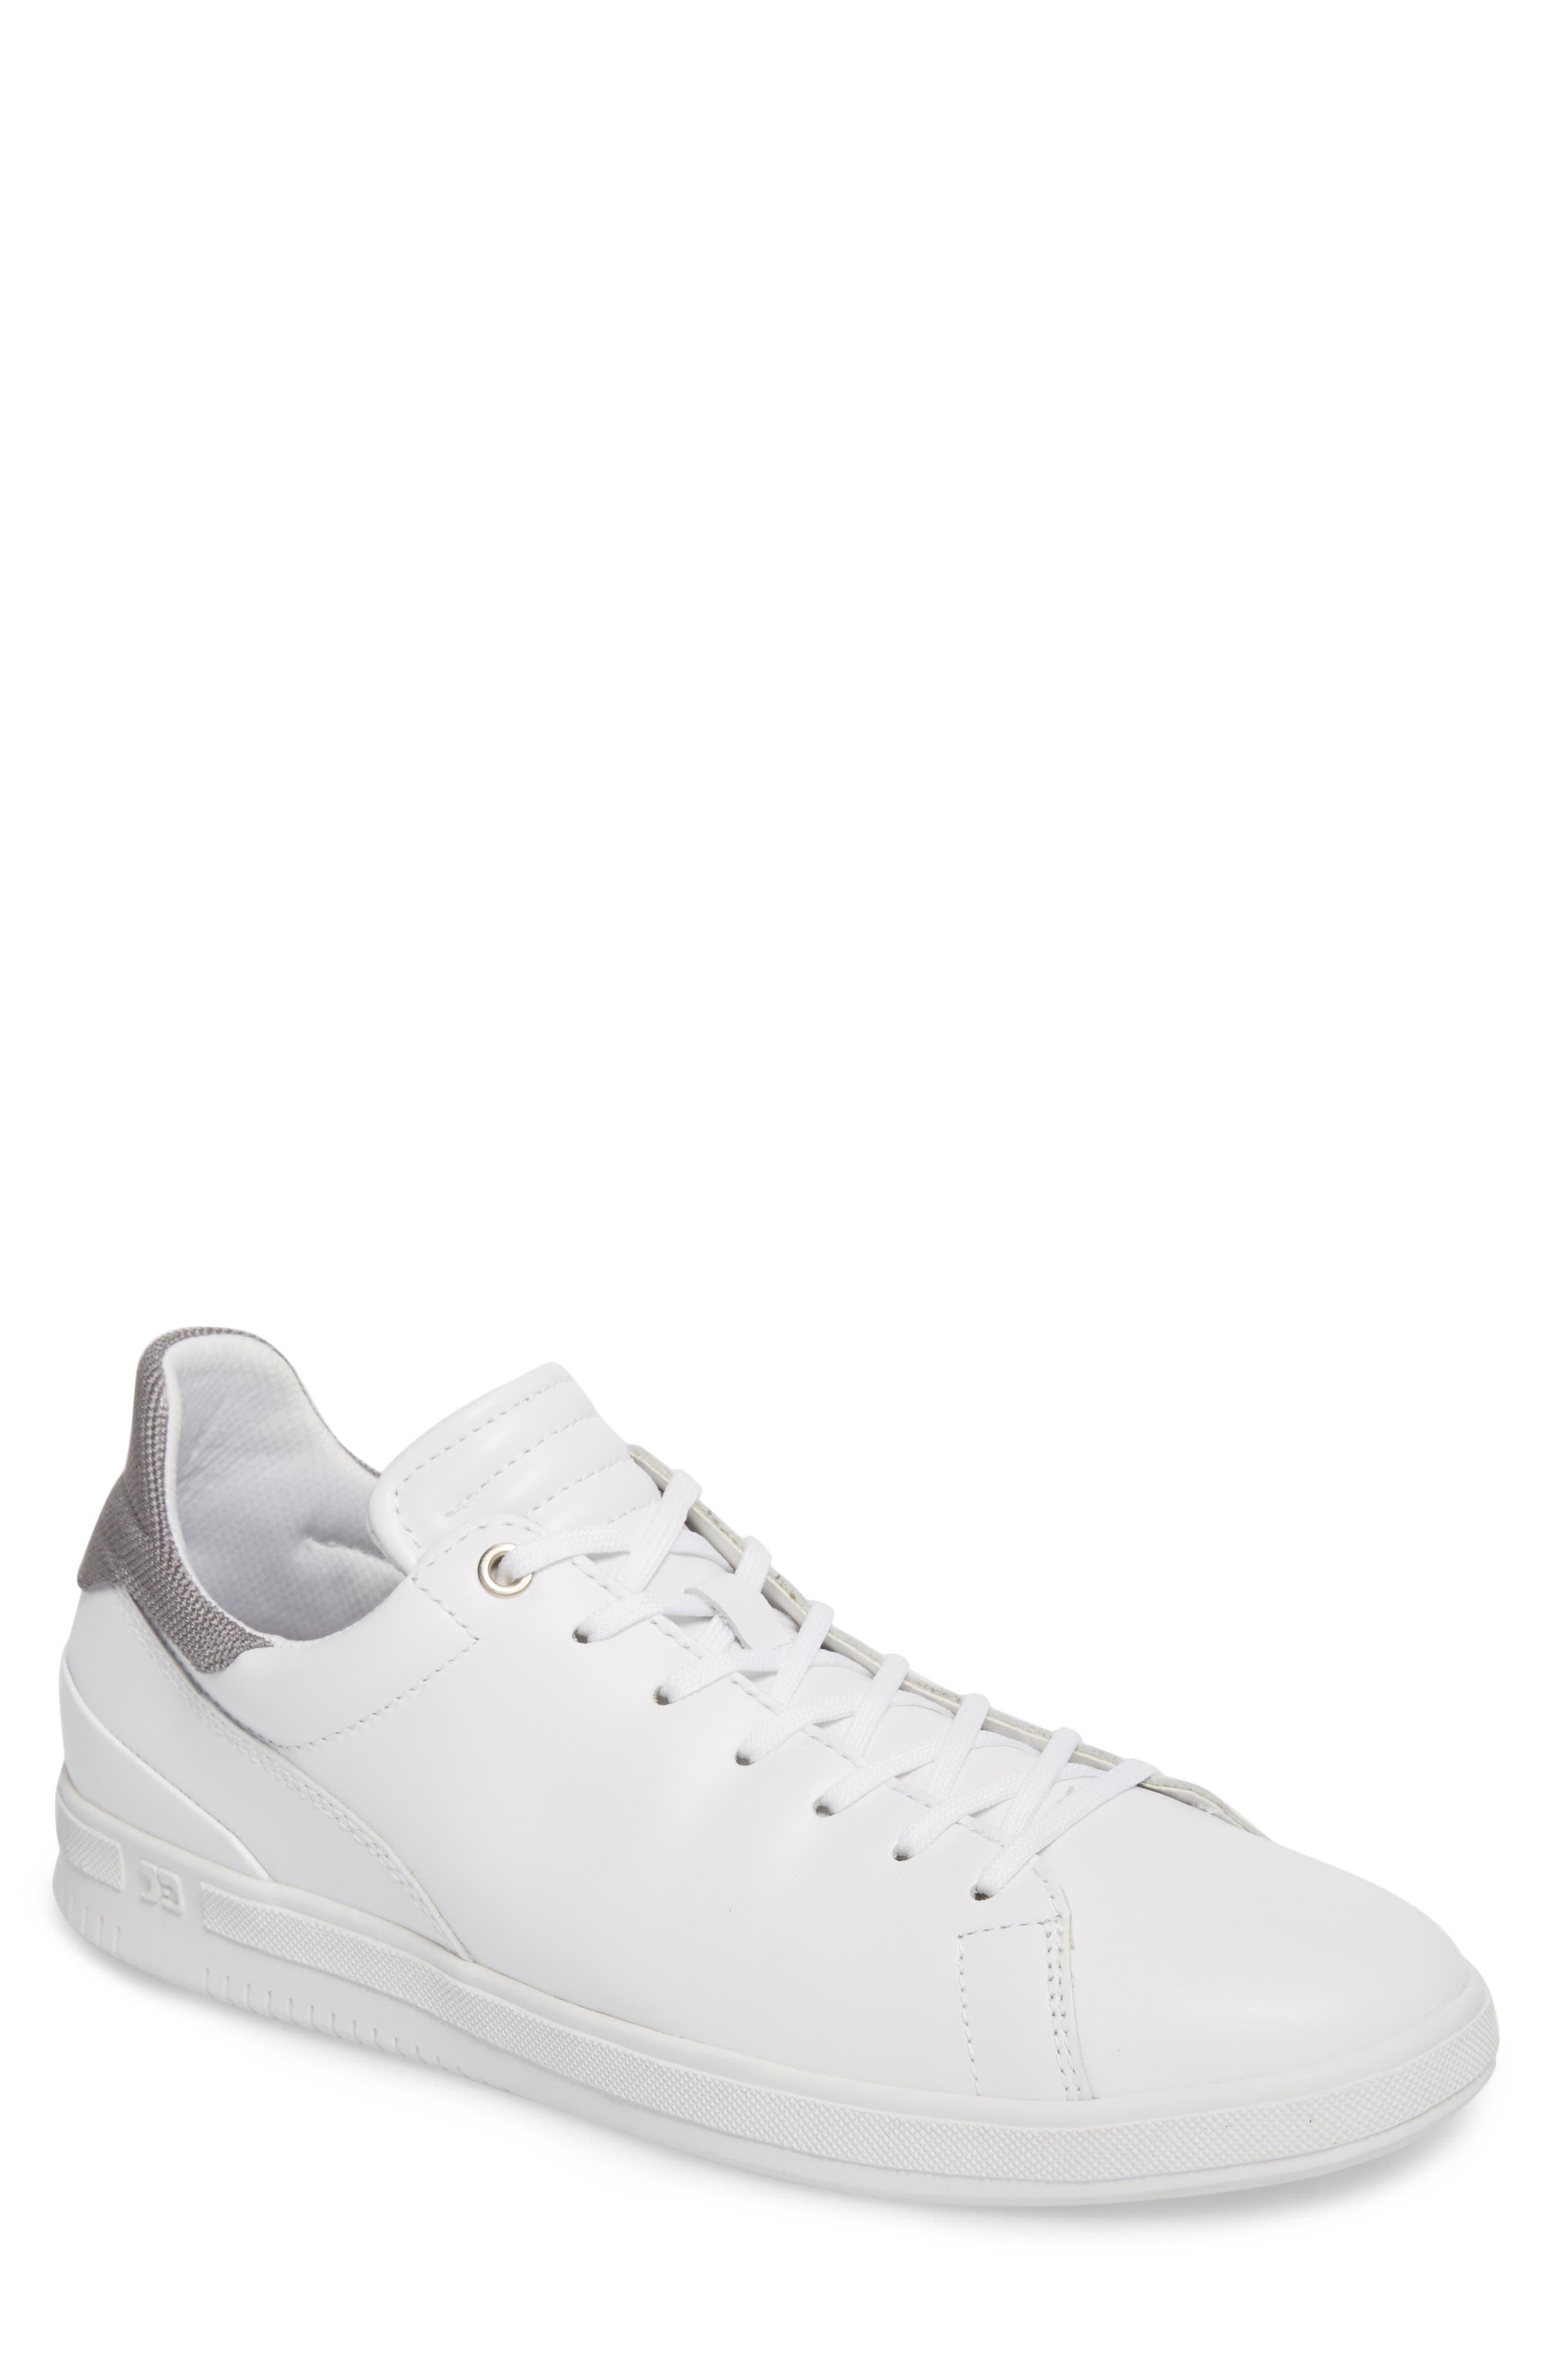 Joe Mama Sneaker,                         Main,                         color, WHITE LEATHER